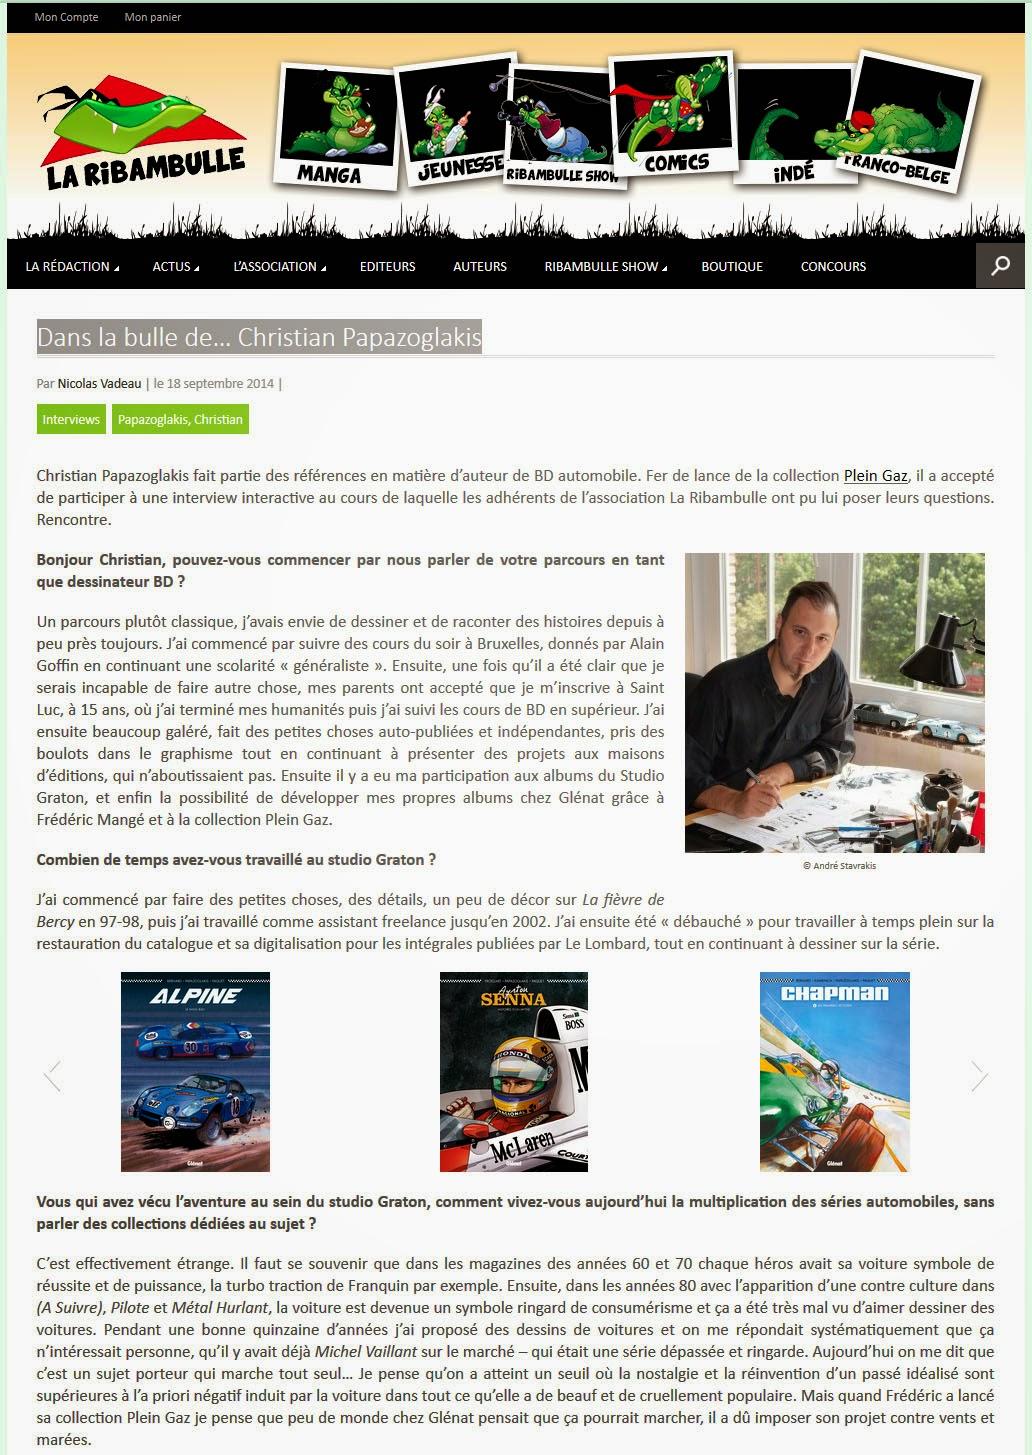 http://la-ribambulle.com/bulle-christian-papazoglakis/